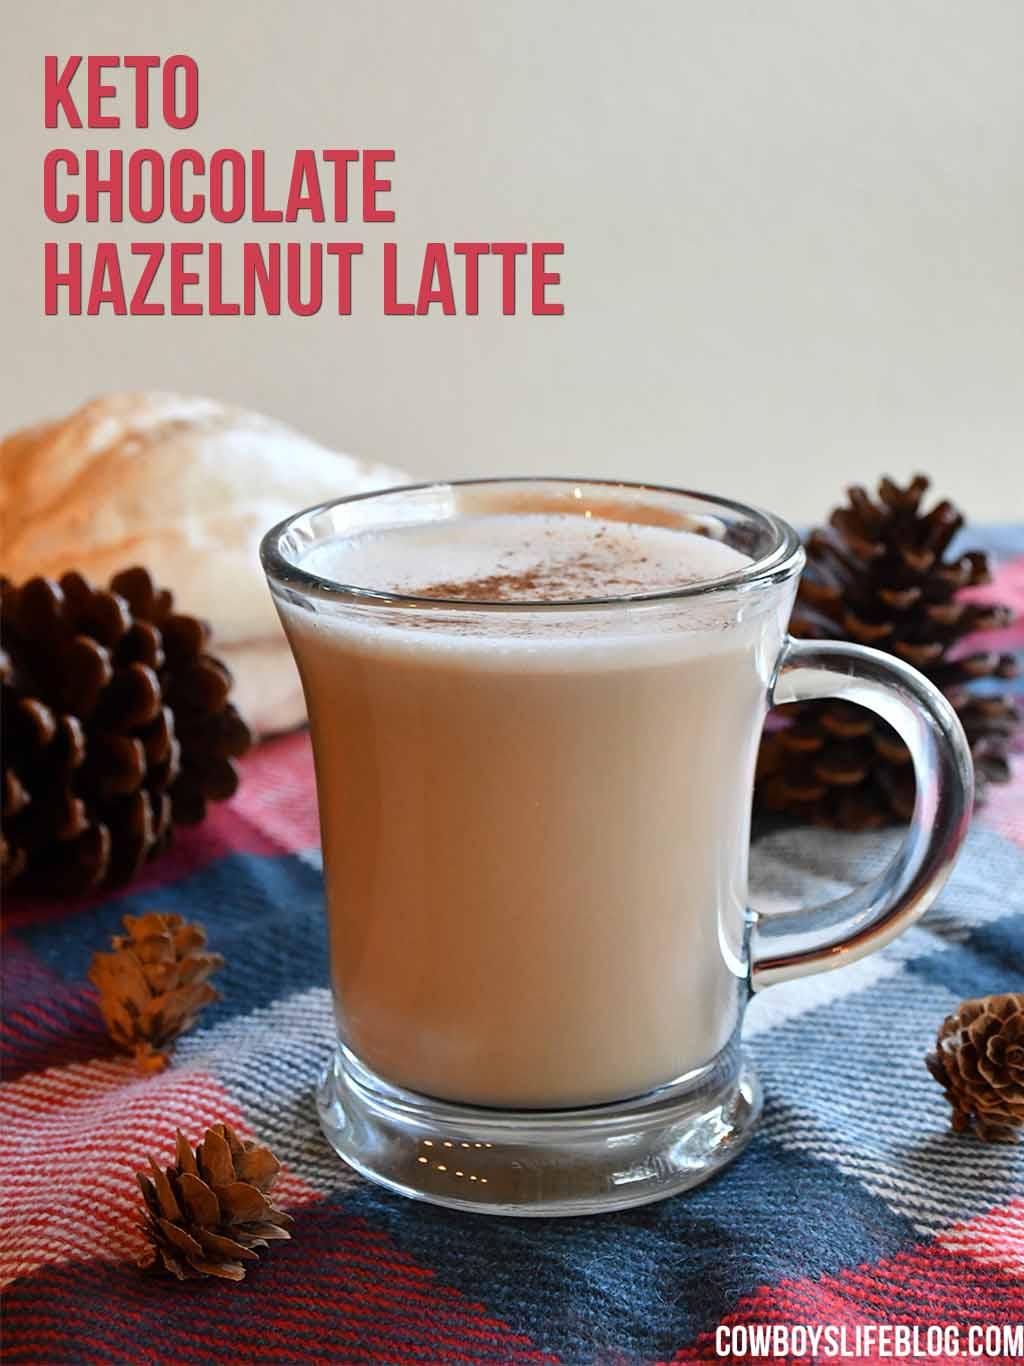 Keto Chocolate Hazelnut Latte